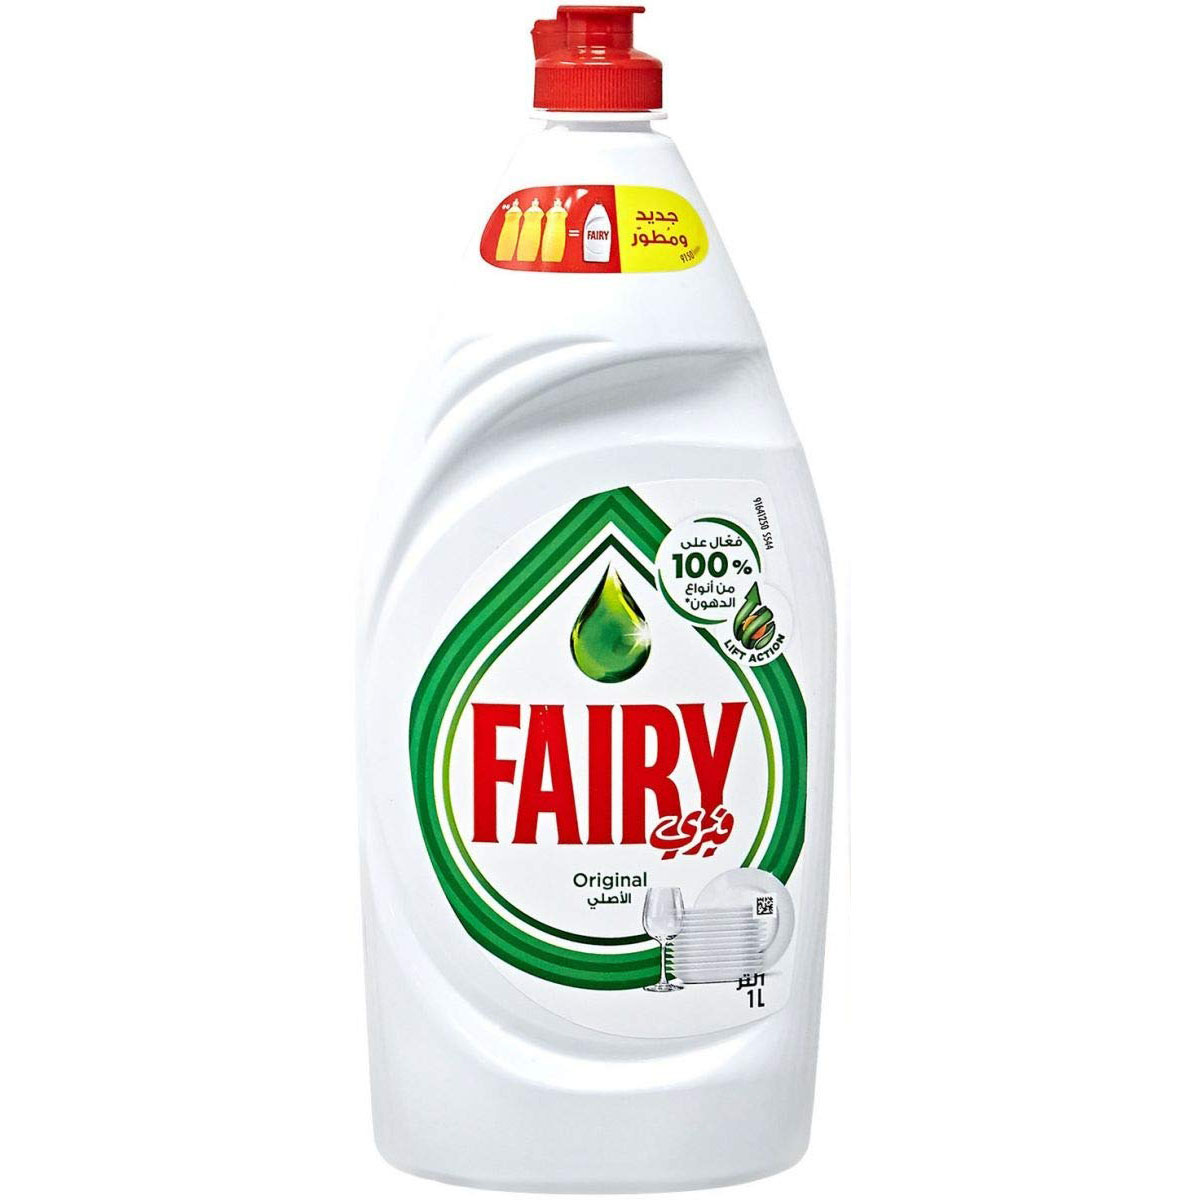 Fairy Dishwashing Liquid Original - 1L (pc)